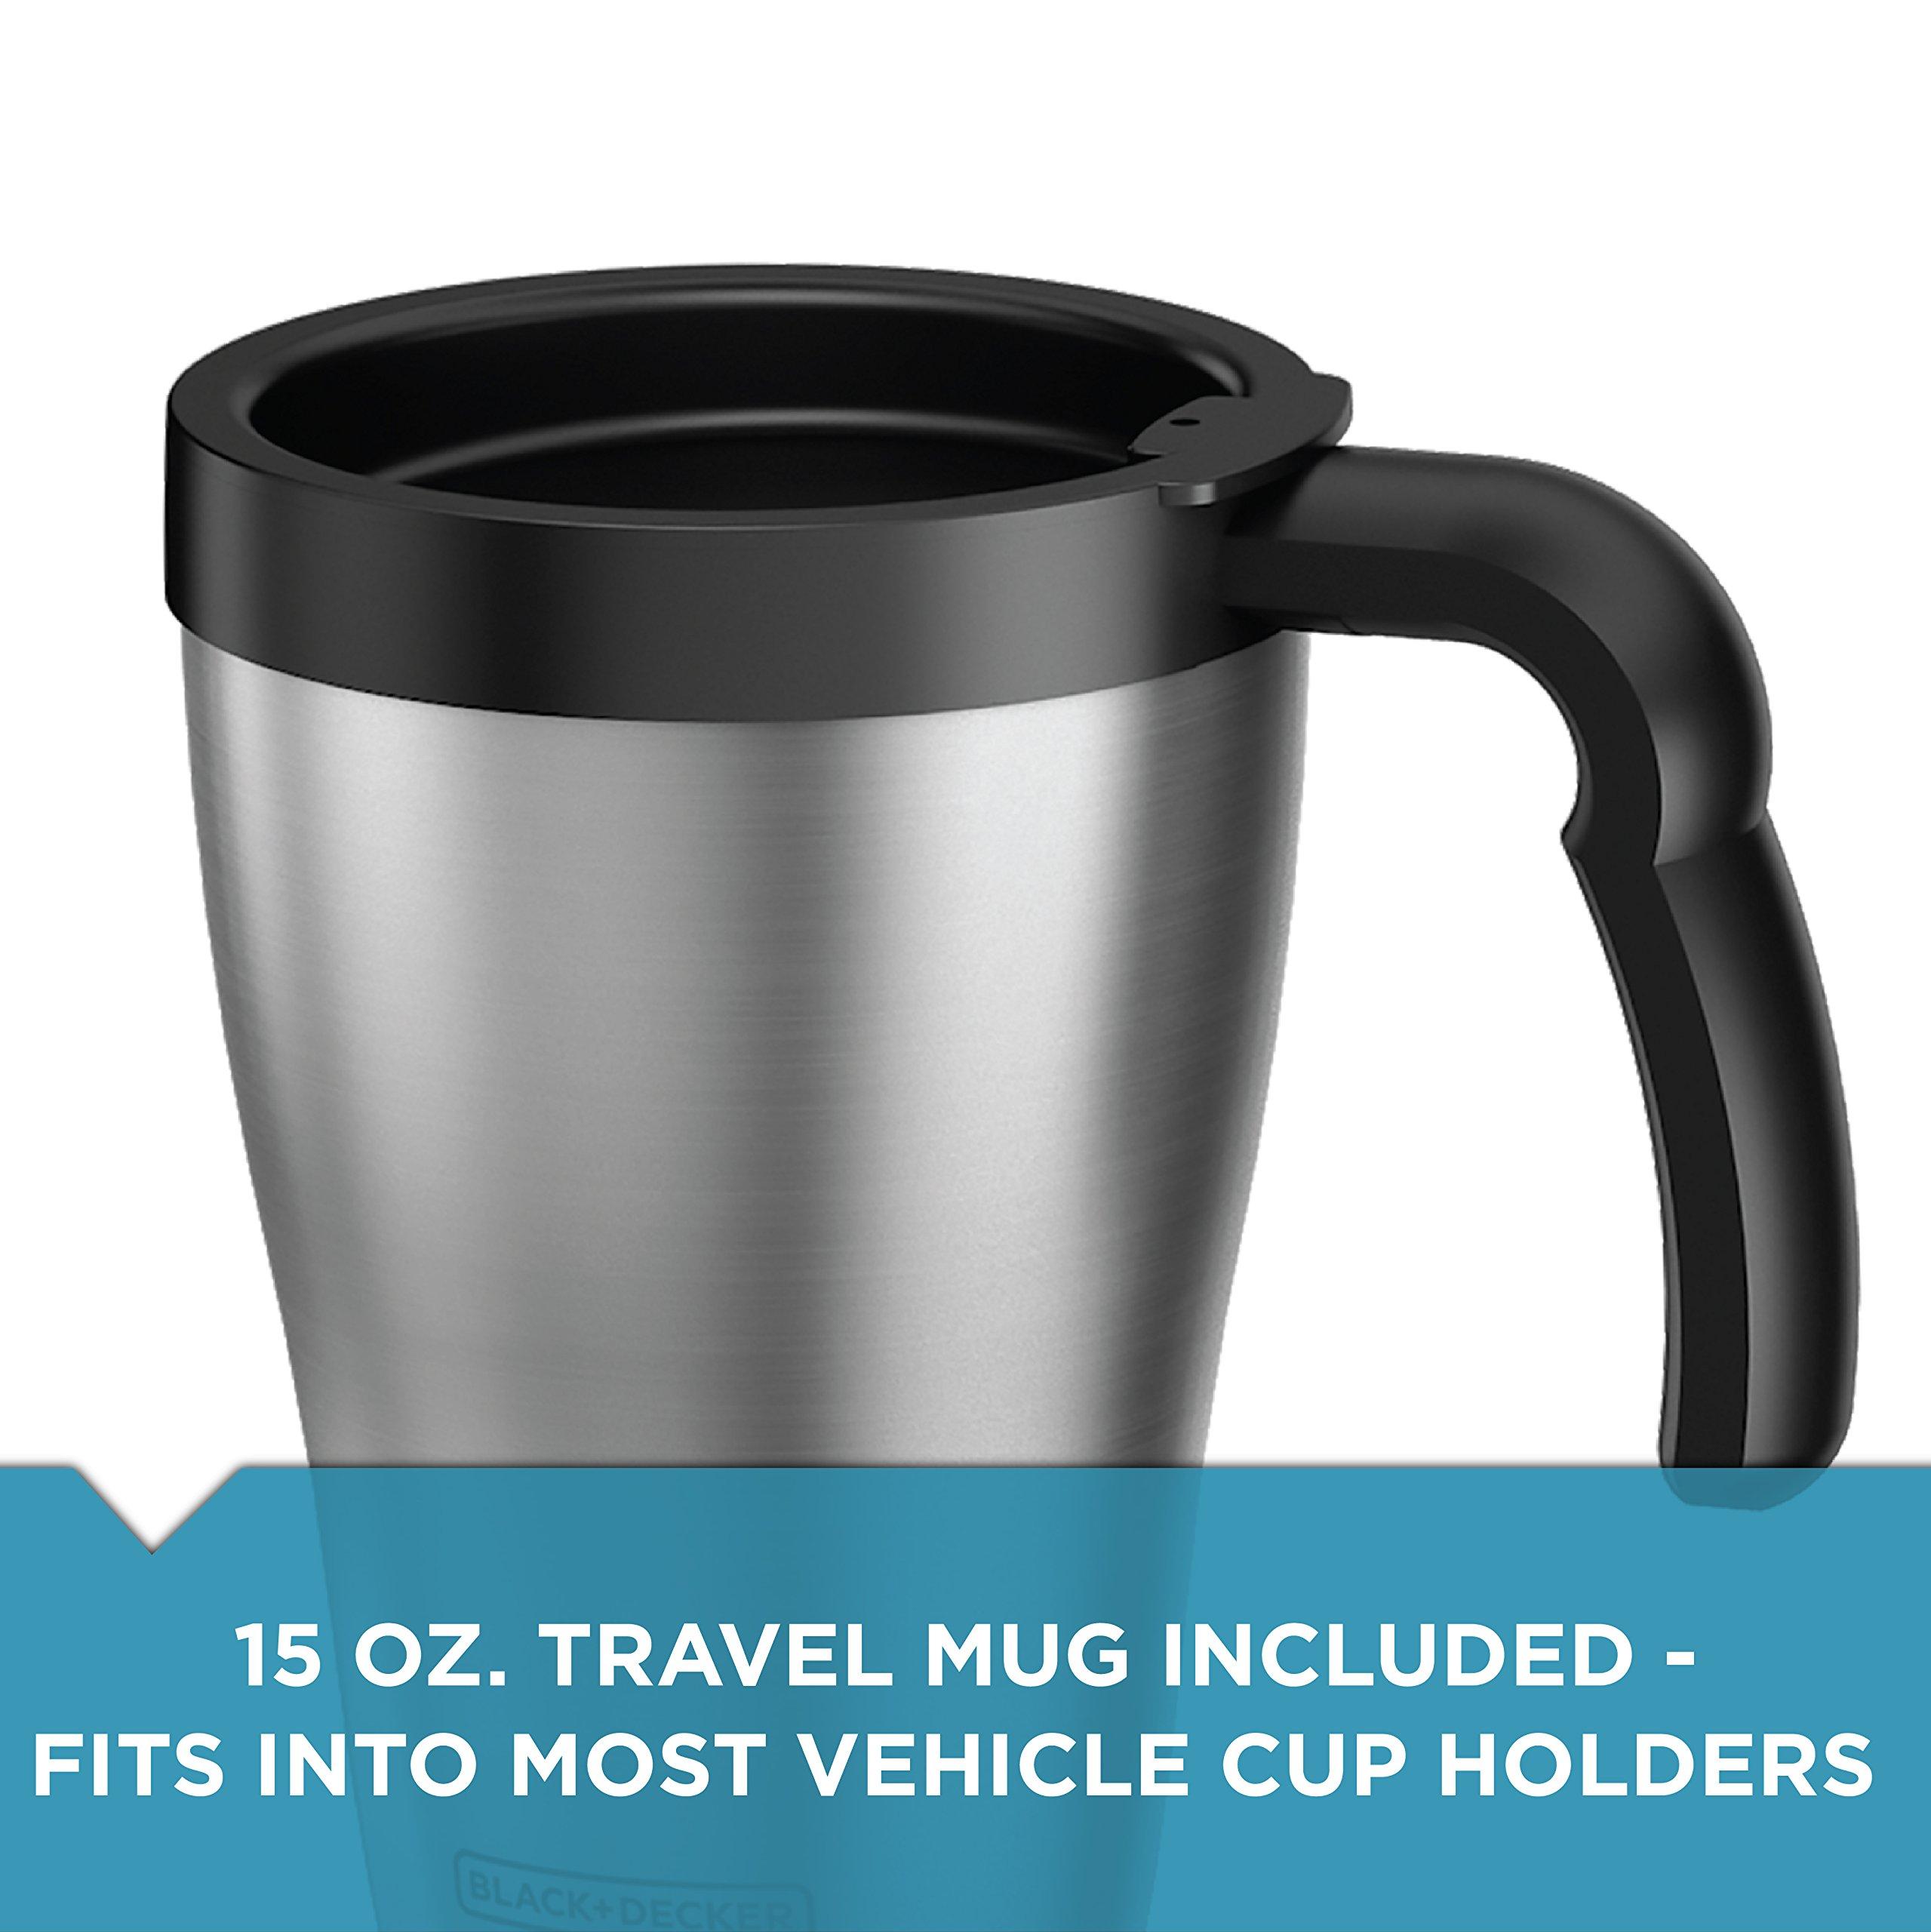 BLACK+DECKER DCM18S Brew 'n Go Personal Coffeemaker with Travel Mug, Black/Stainless Steel by Black & Decker (Image #7)